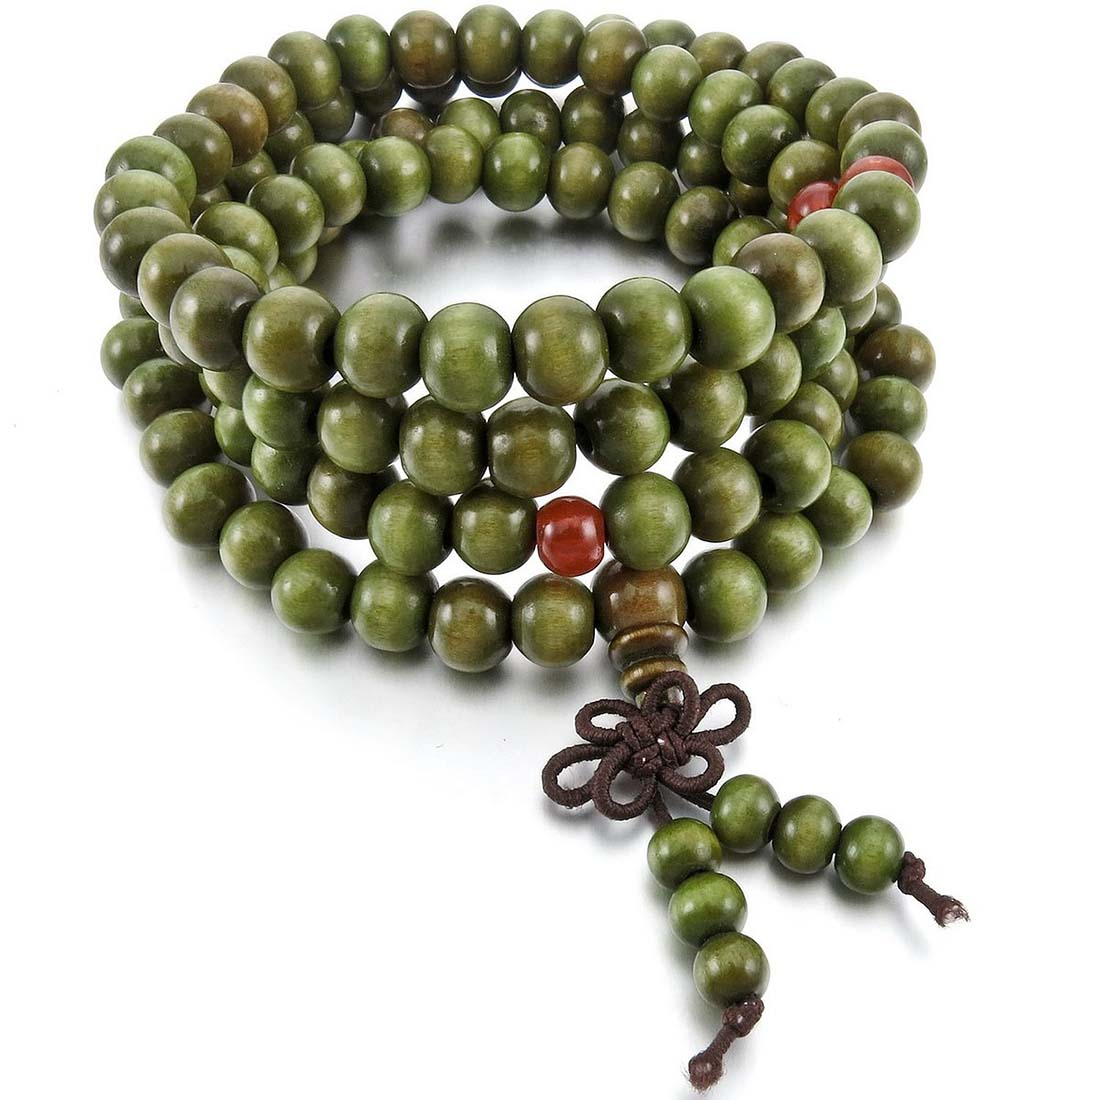 caca16832a6ef Detail Feedback Questions about 108pcs Tibetan Buddhist Prayer Beads  Necklace Buddha Mala Rosary Wooden Charm Bracelet Bangle DIY Jewelry 8mm on  ...